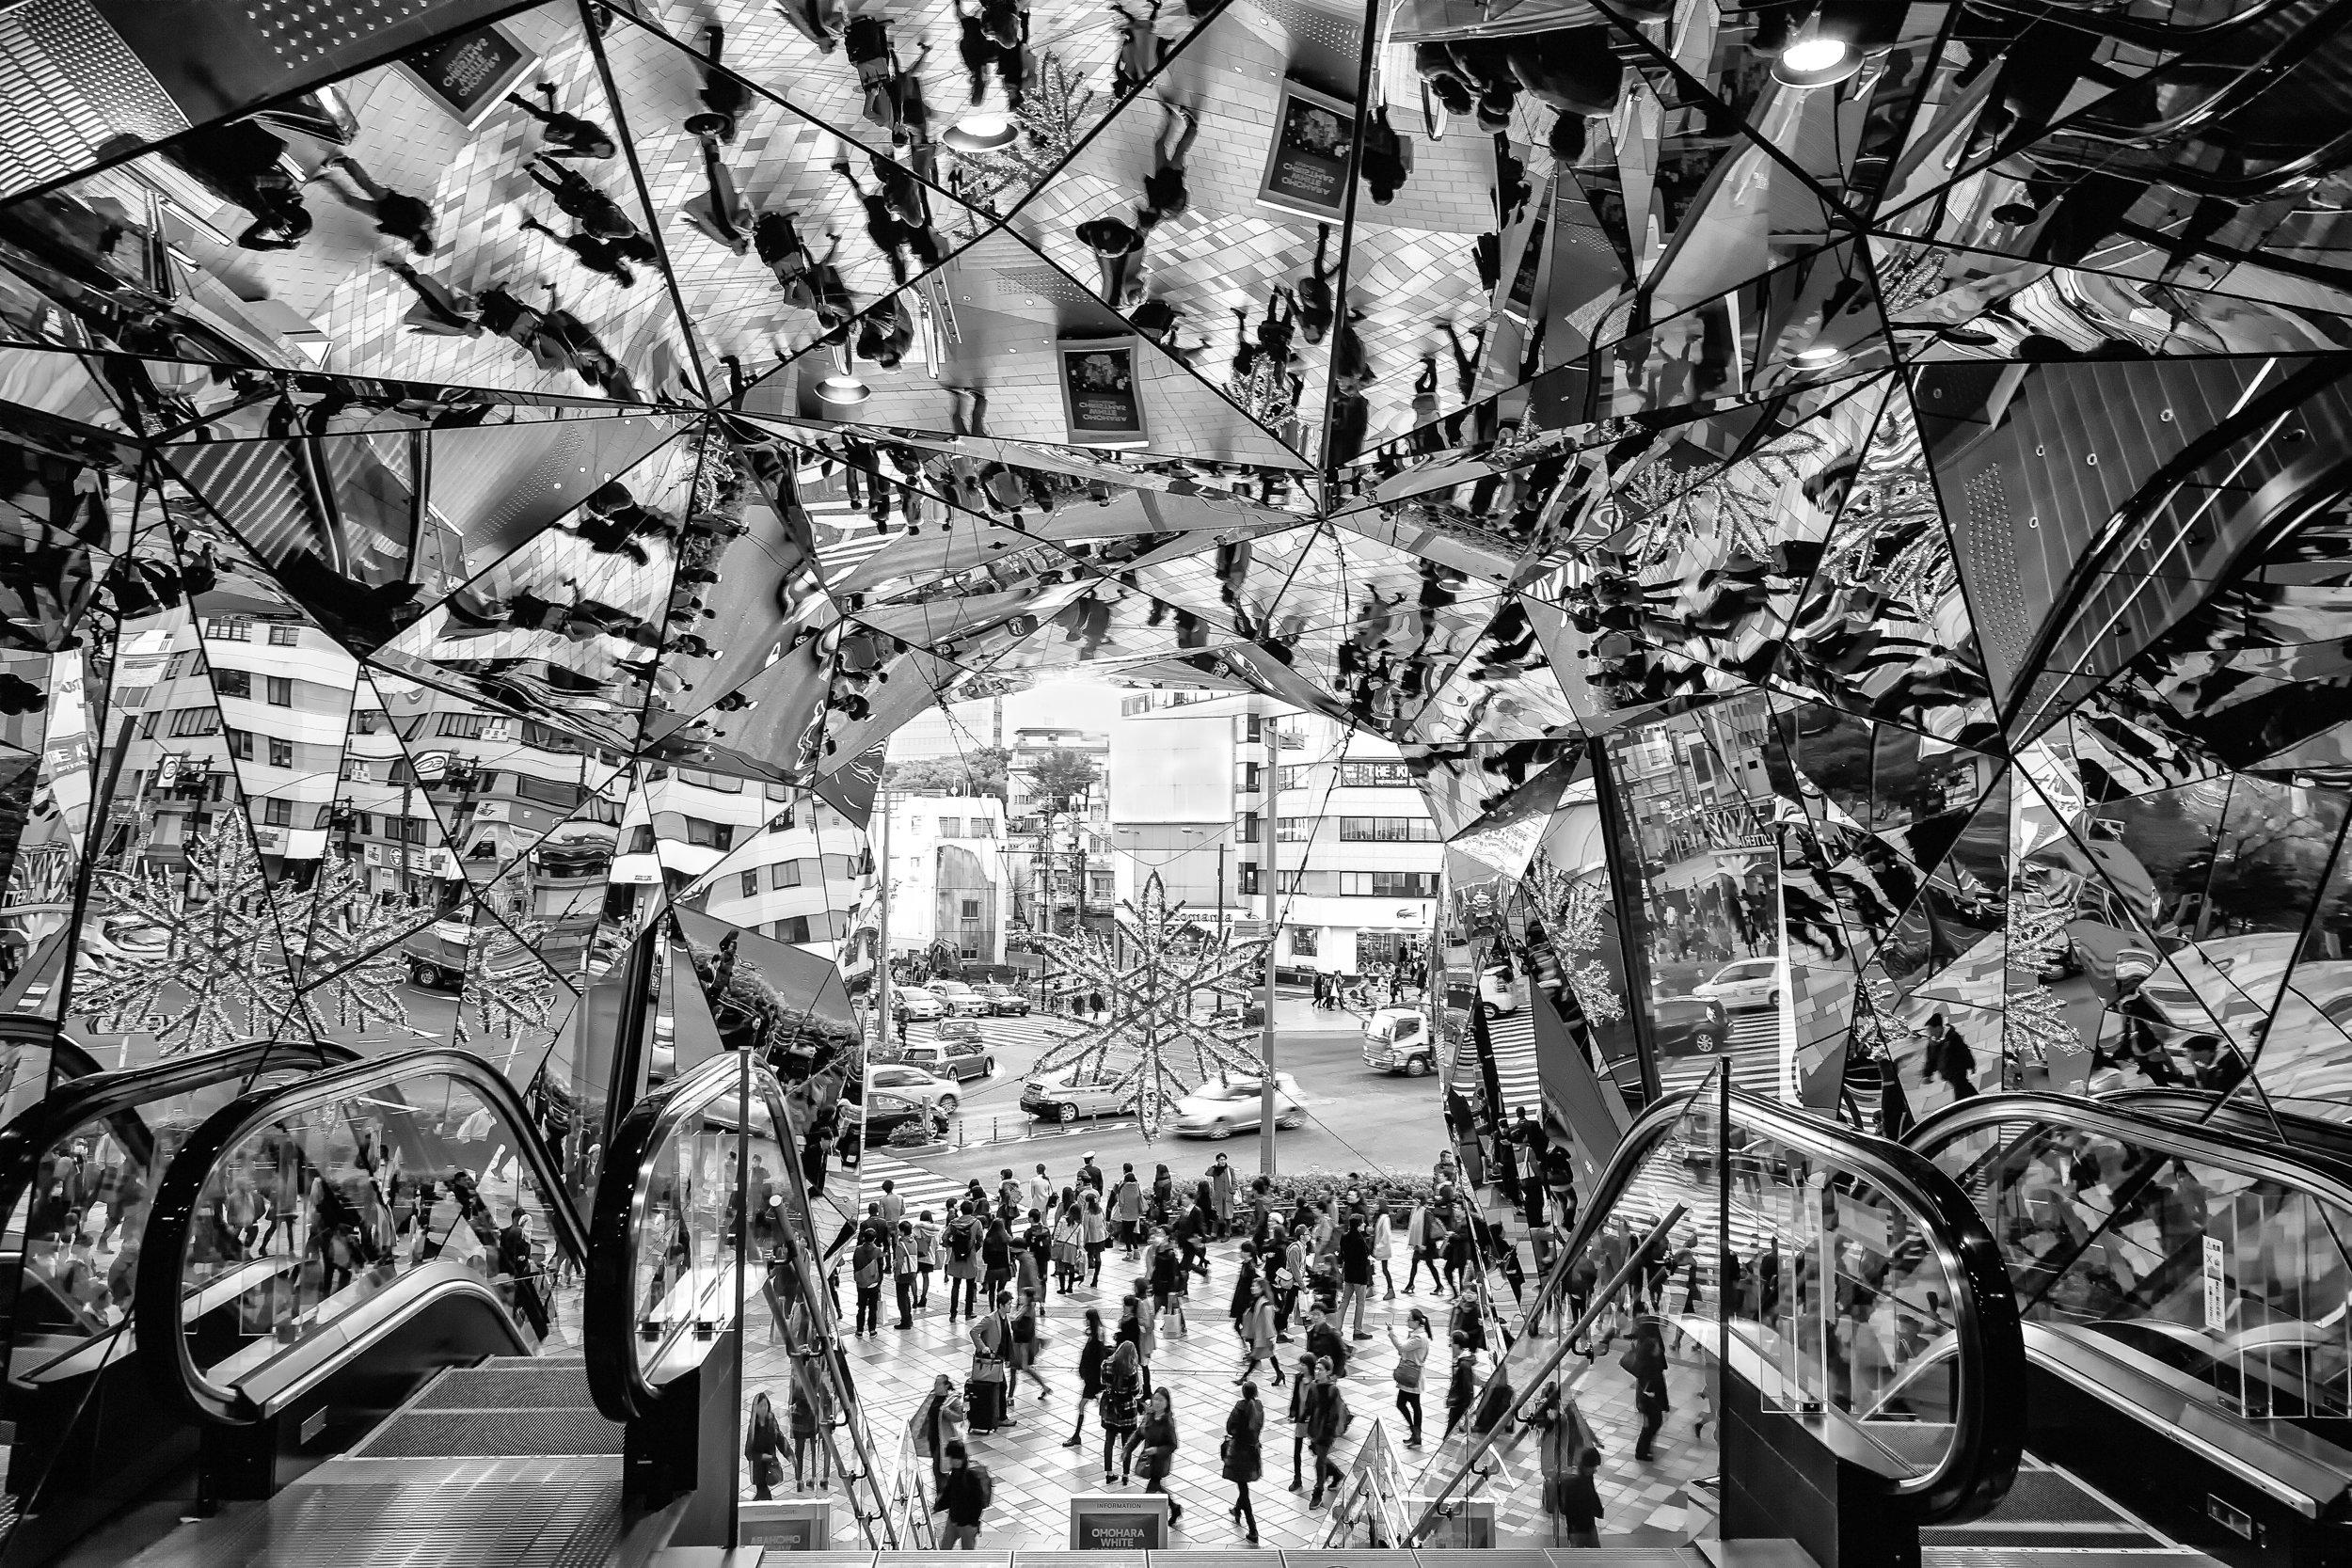 PHOTOGRAPHY: Andy Yee • Canon EOS 5D MkIII • 16-28mm Ƒ/2.8 @ 25MM • Ƒ/9 • 1/25 • ISO 100